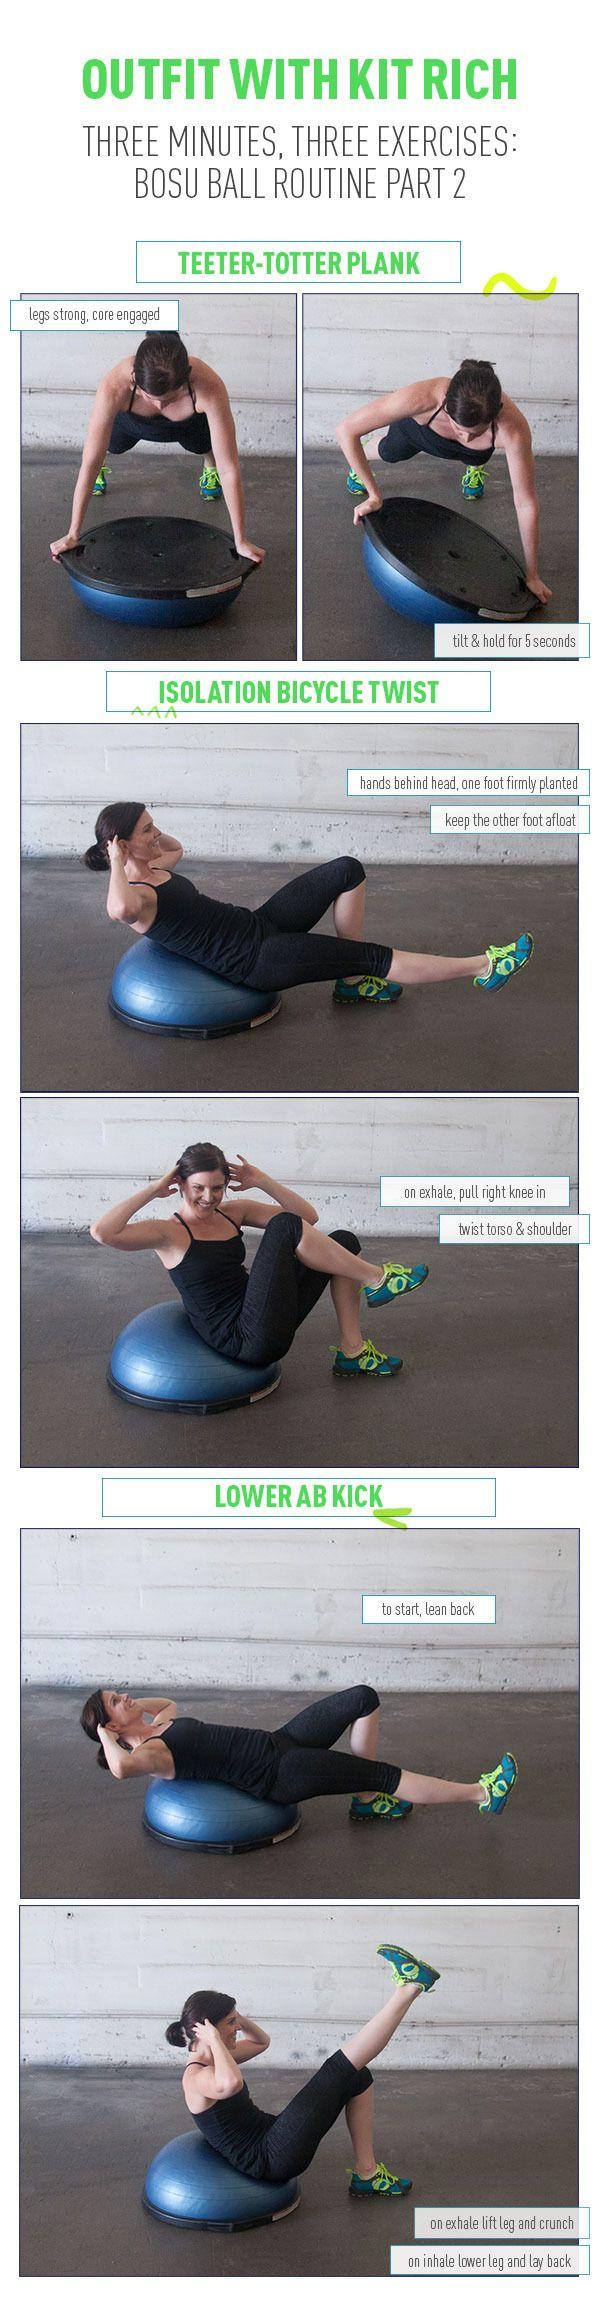 www.facebook.com/myactivelifestyle Three Minutes, Three Exercises: Bosu Ball Routine Part 2